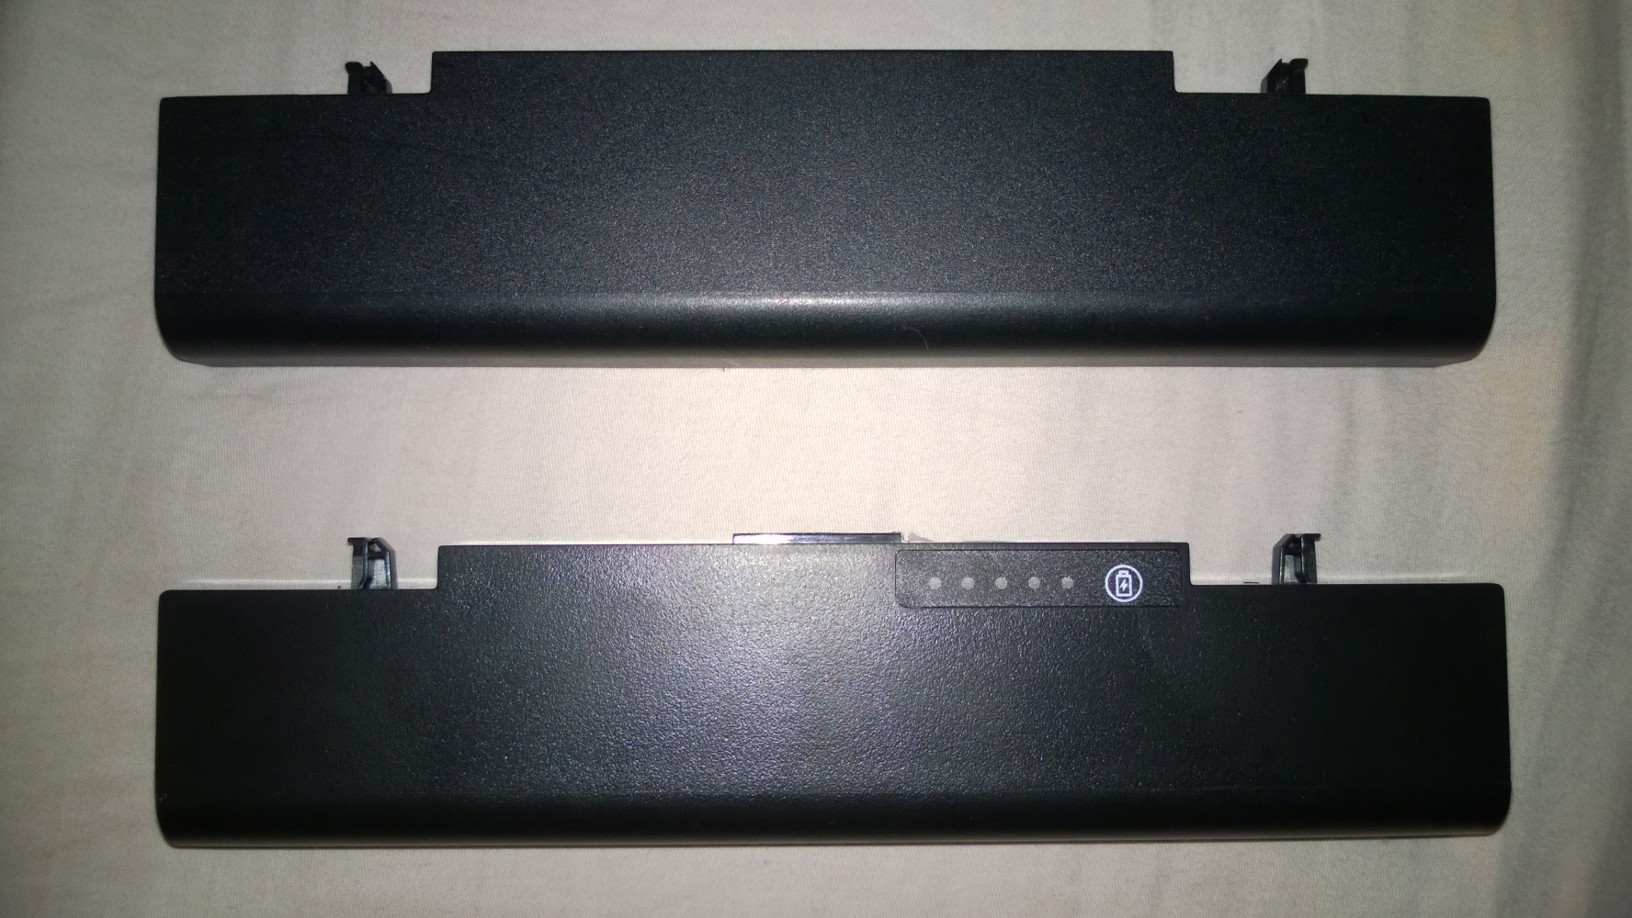 samsun np350v5c - Nowa bateria- orygina� czy podr�bka